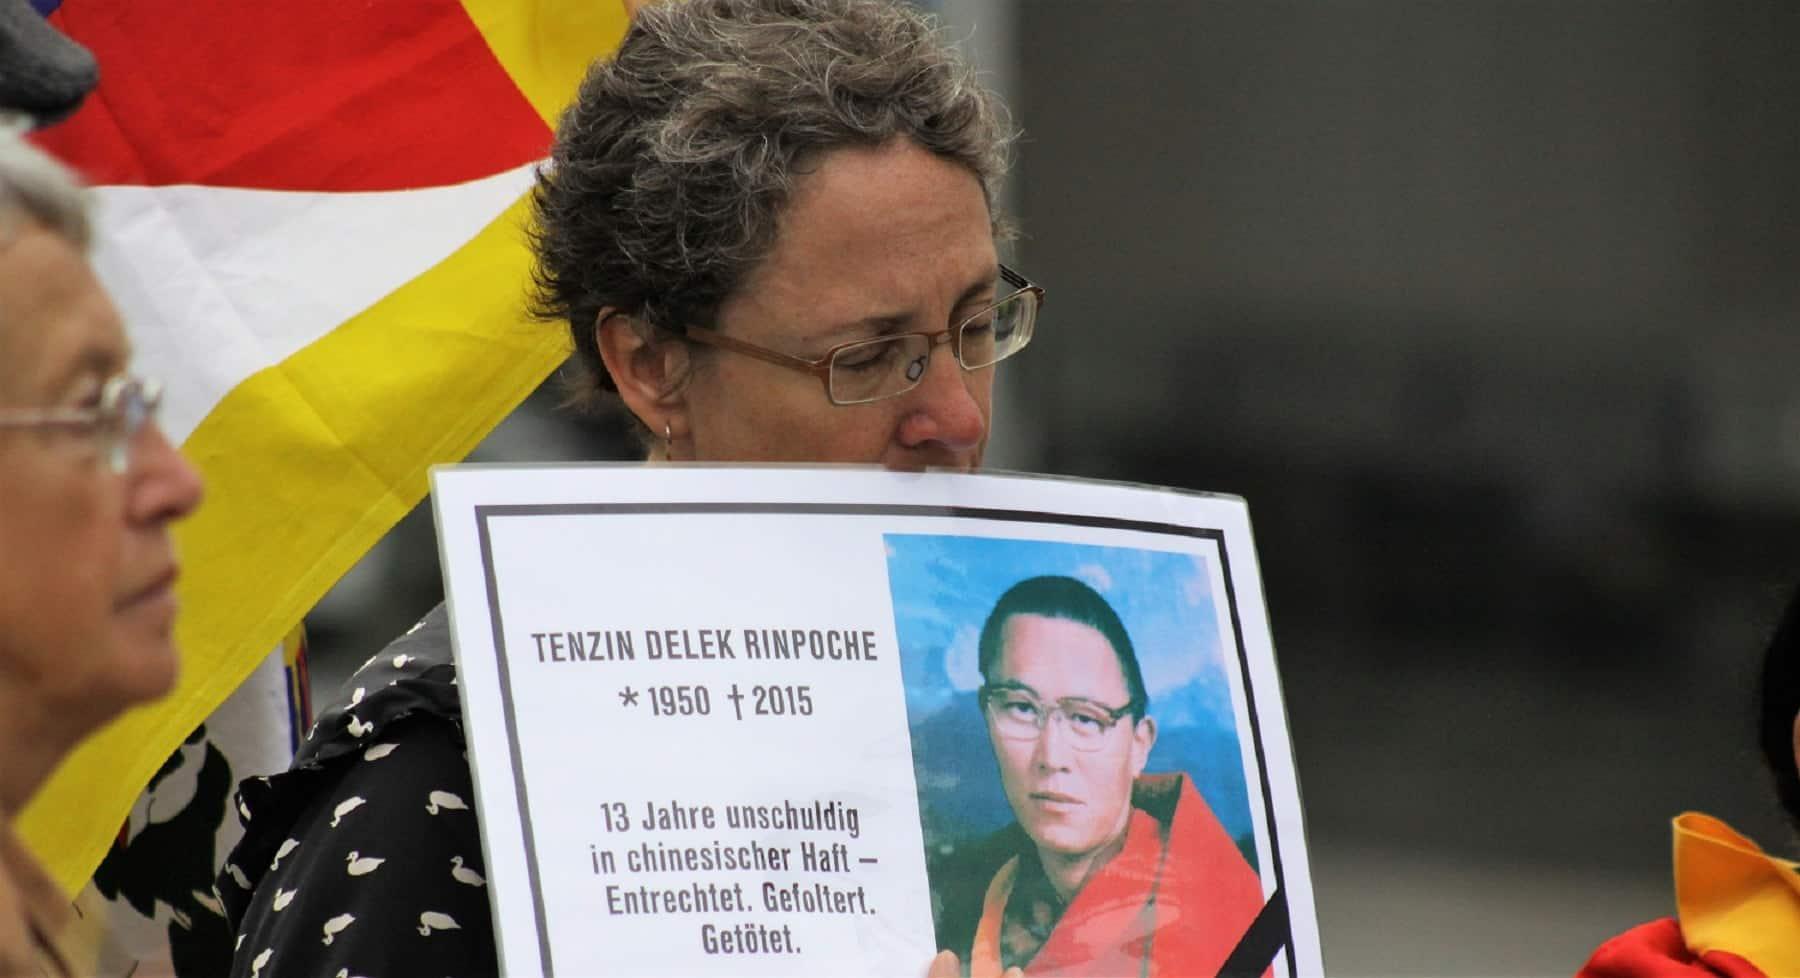 Mahnwache für Tenzin Delek Rinpoche in Berlin 2015